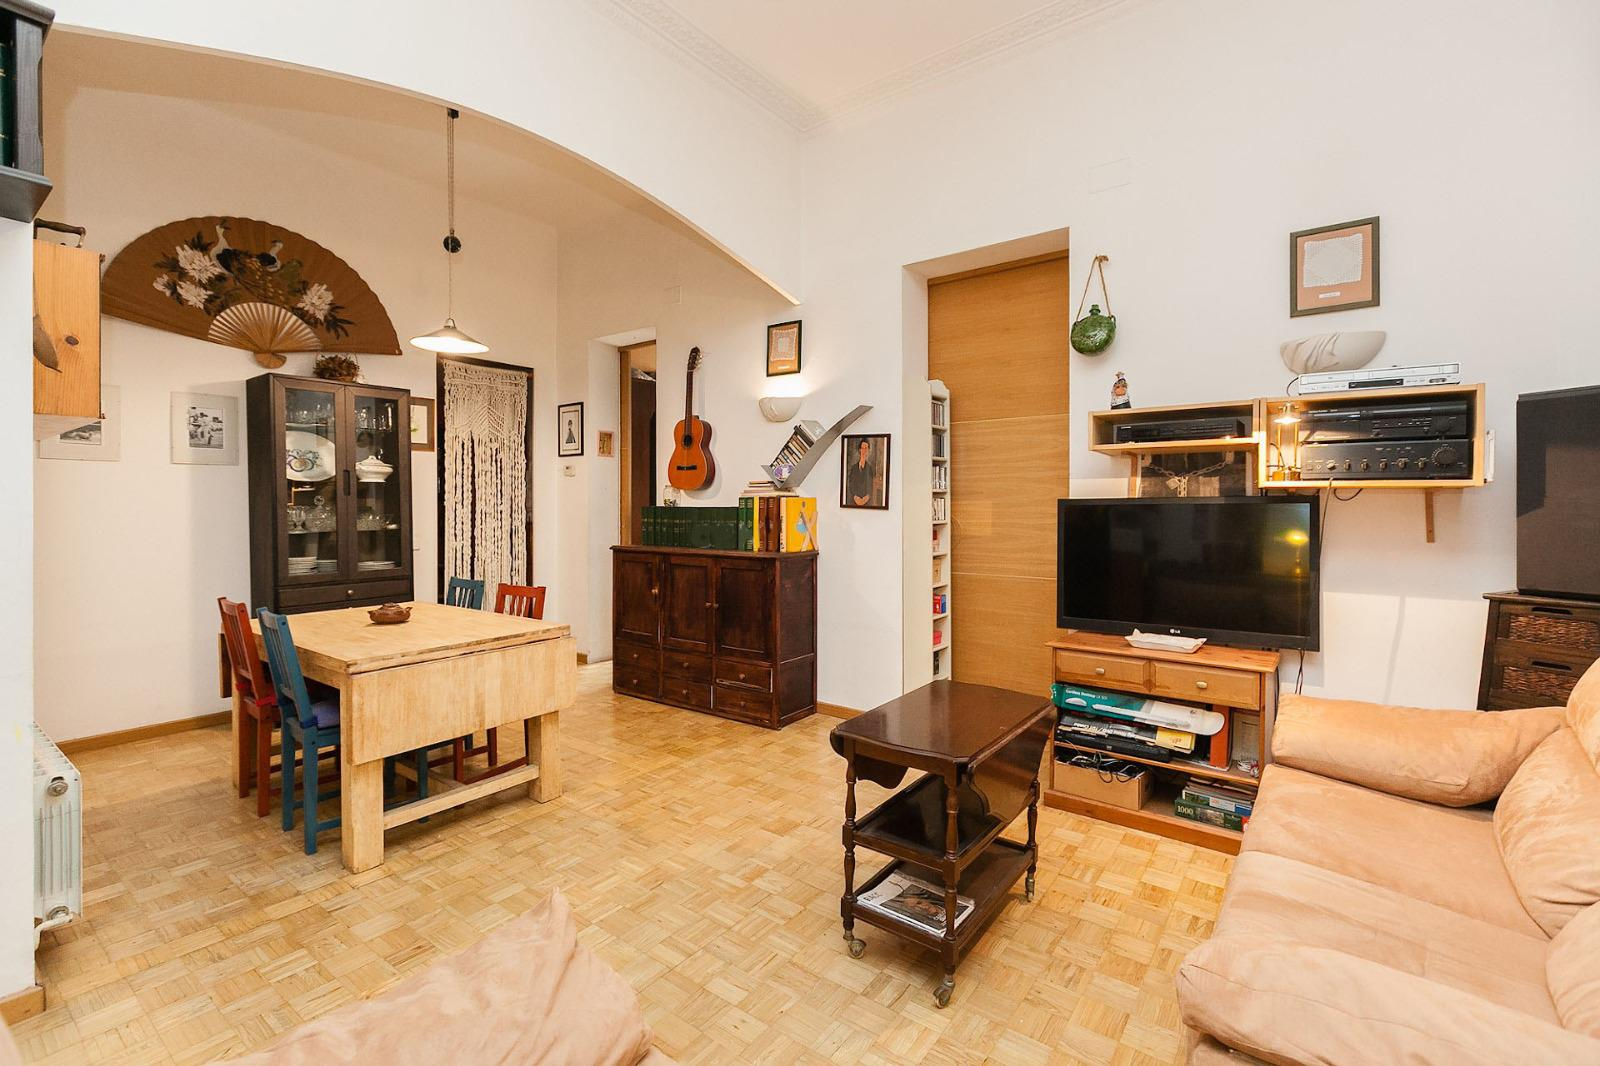 247916 Flat for sale in Sarrià-Sant Gervasi, Sant Gervasi-Galvany 7